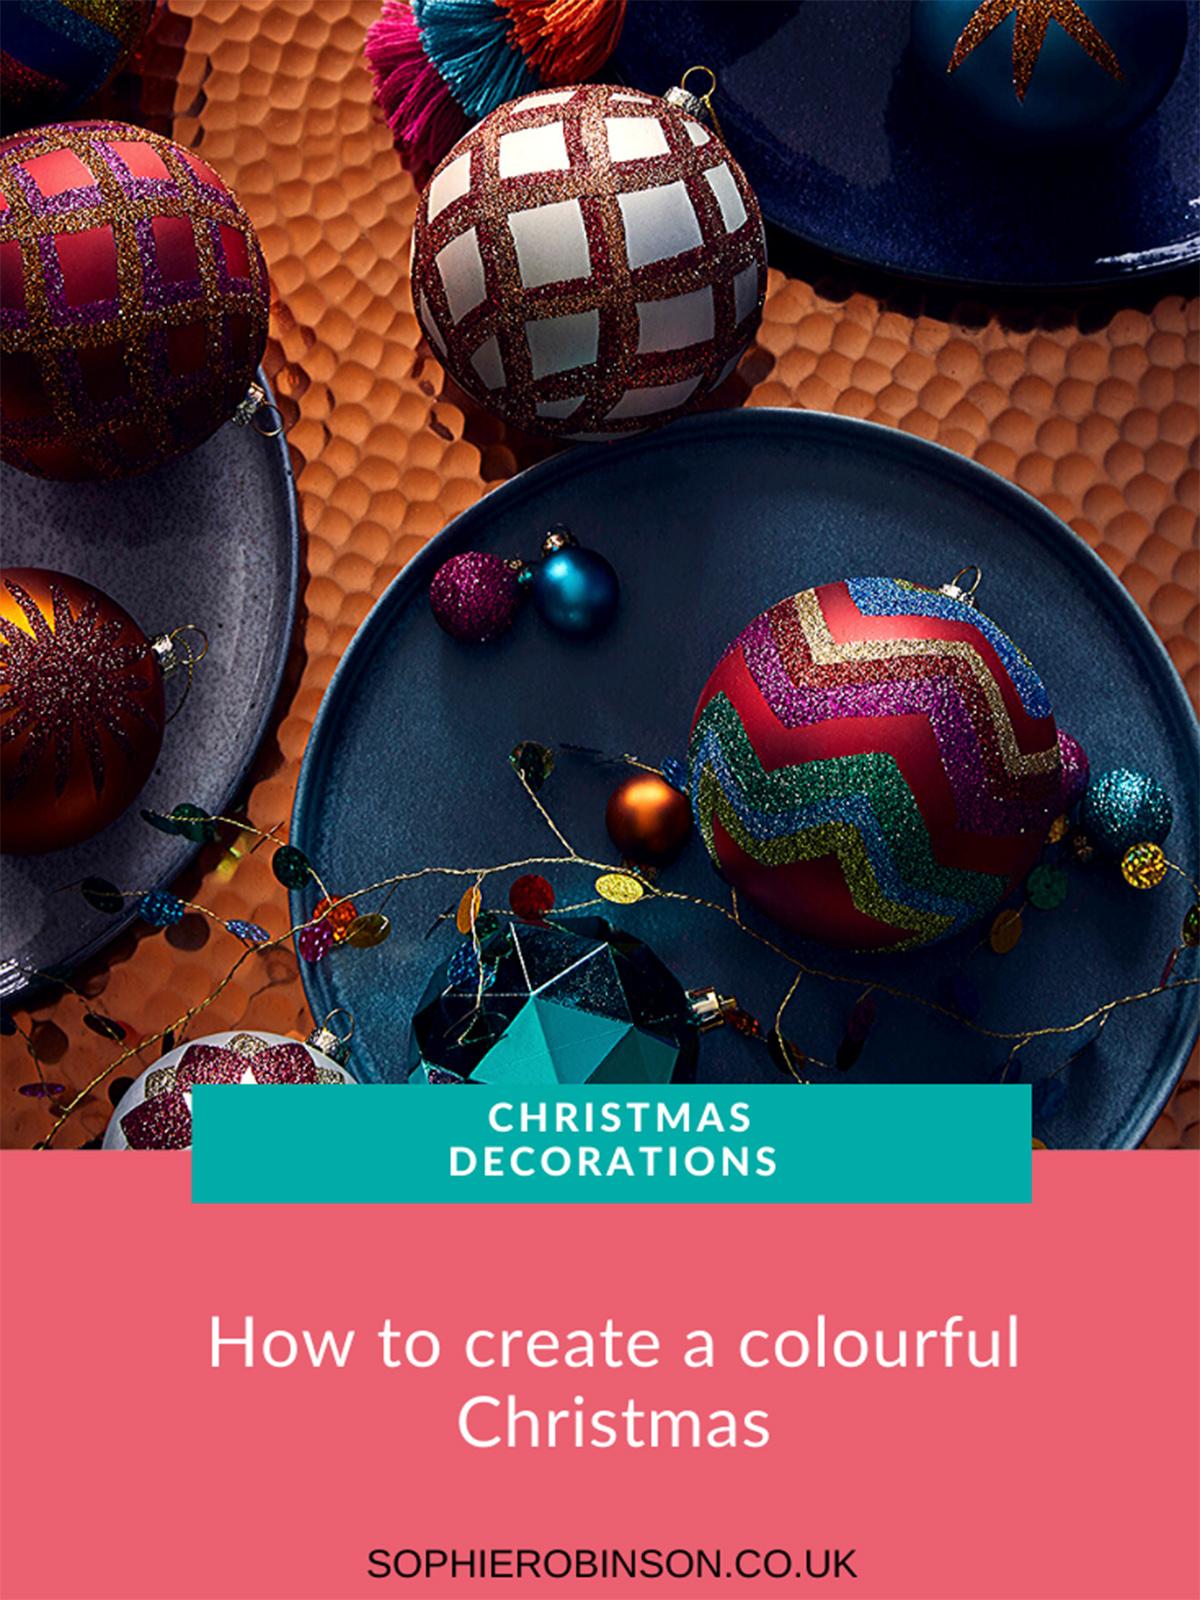 Interior designer Sophie Robinson collaborates with Habitat UK to create three Christmas looks. #habitat #christmas #sophierobinson